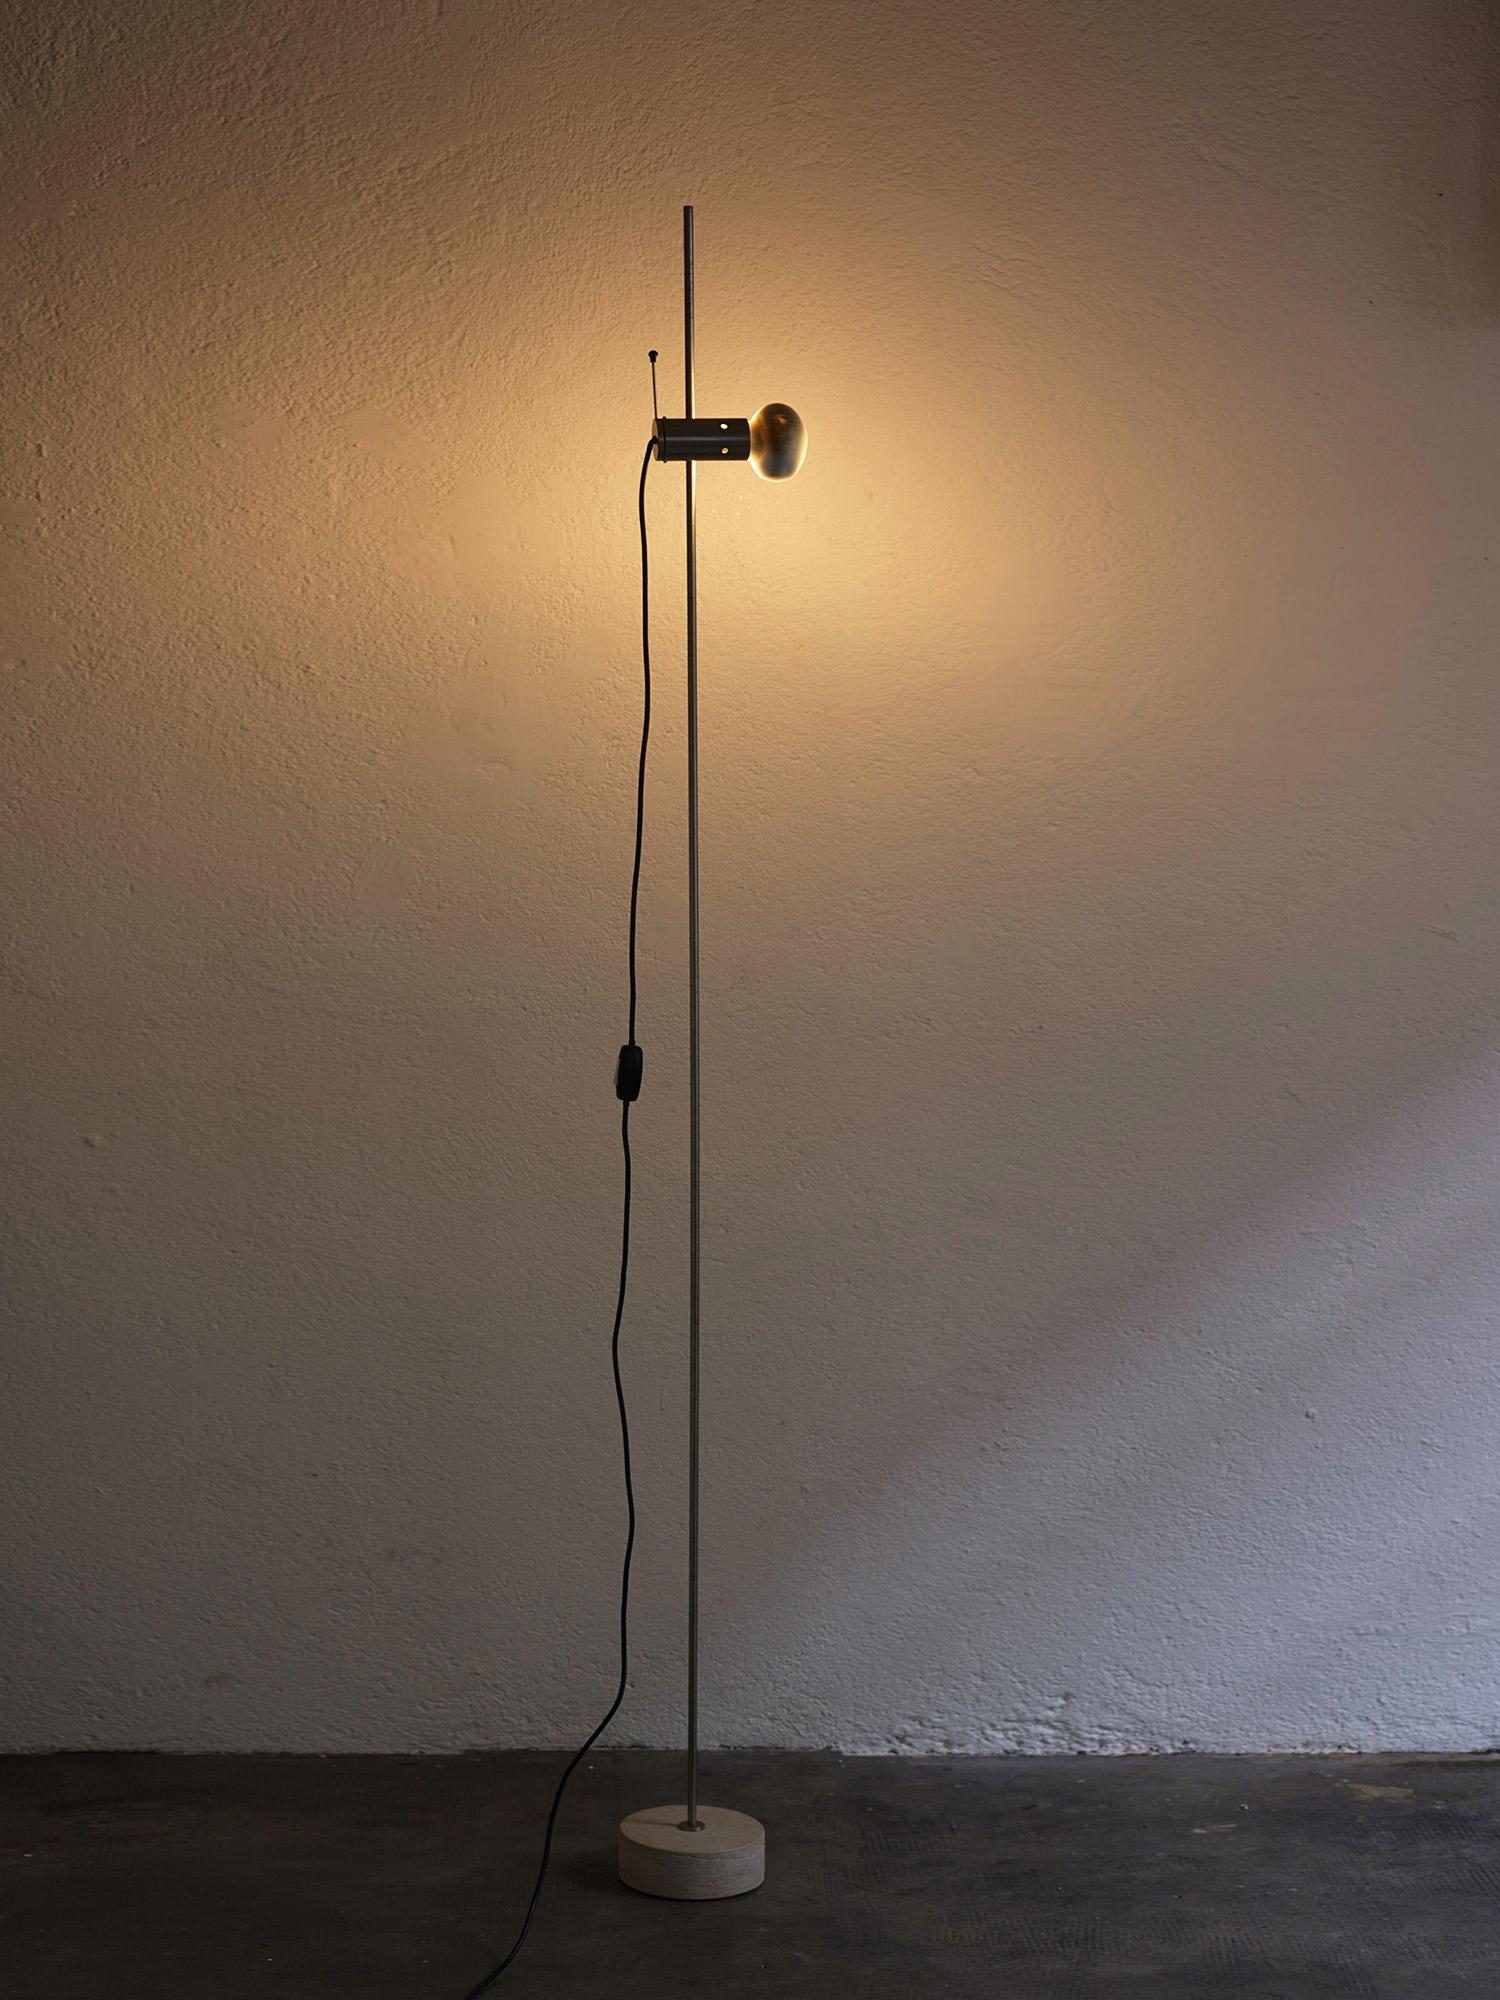 floor-lamp-model-387-by-tito-agnoli-image-01